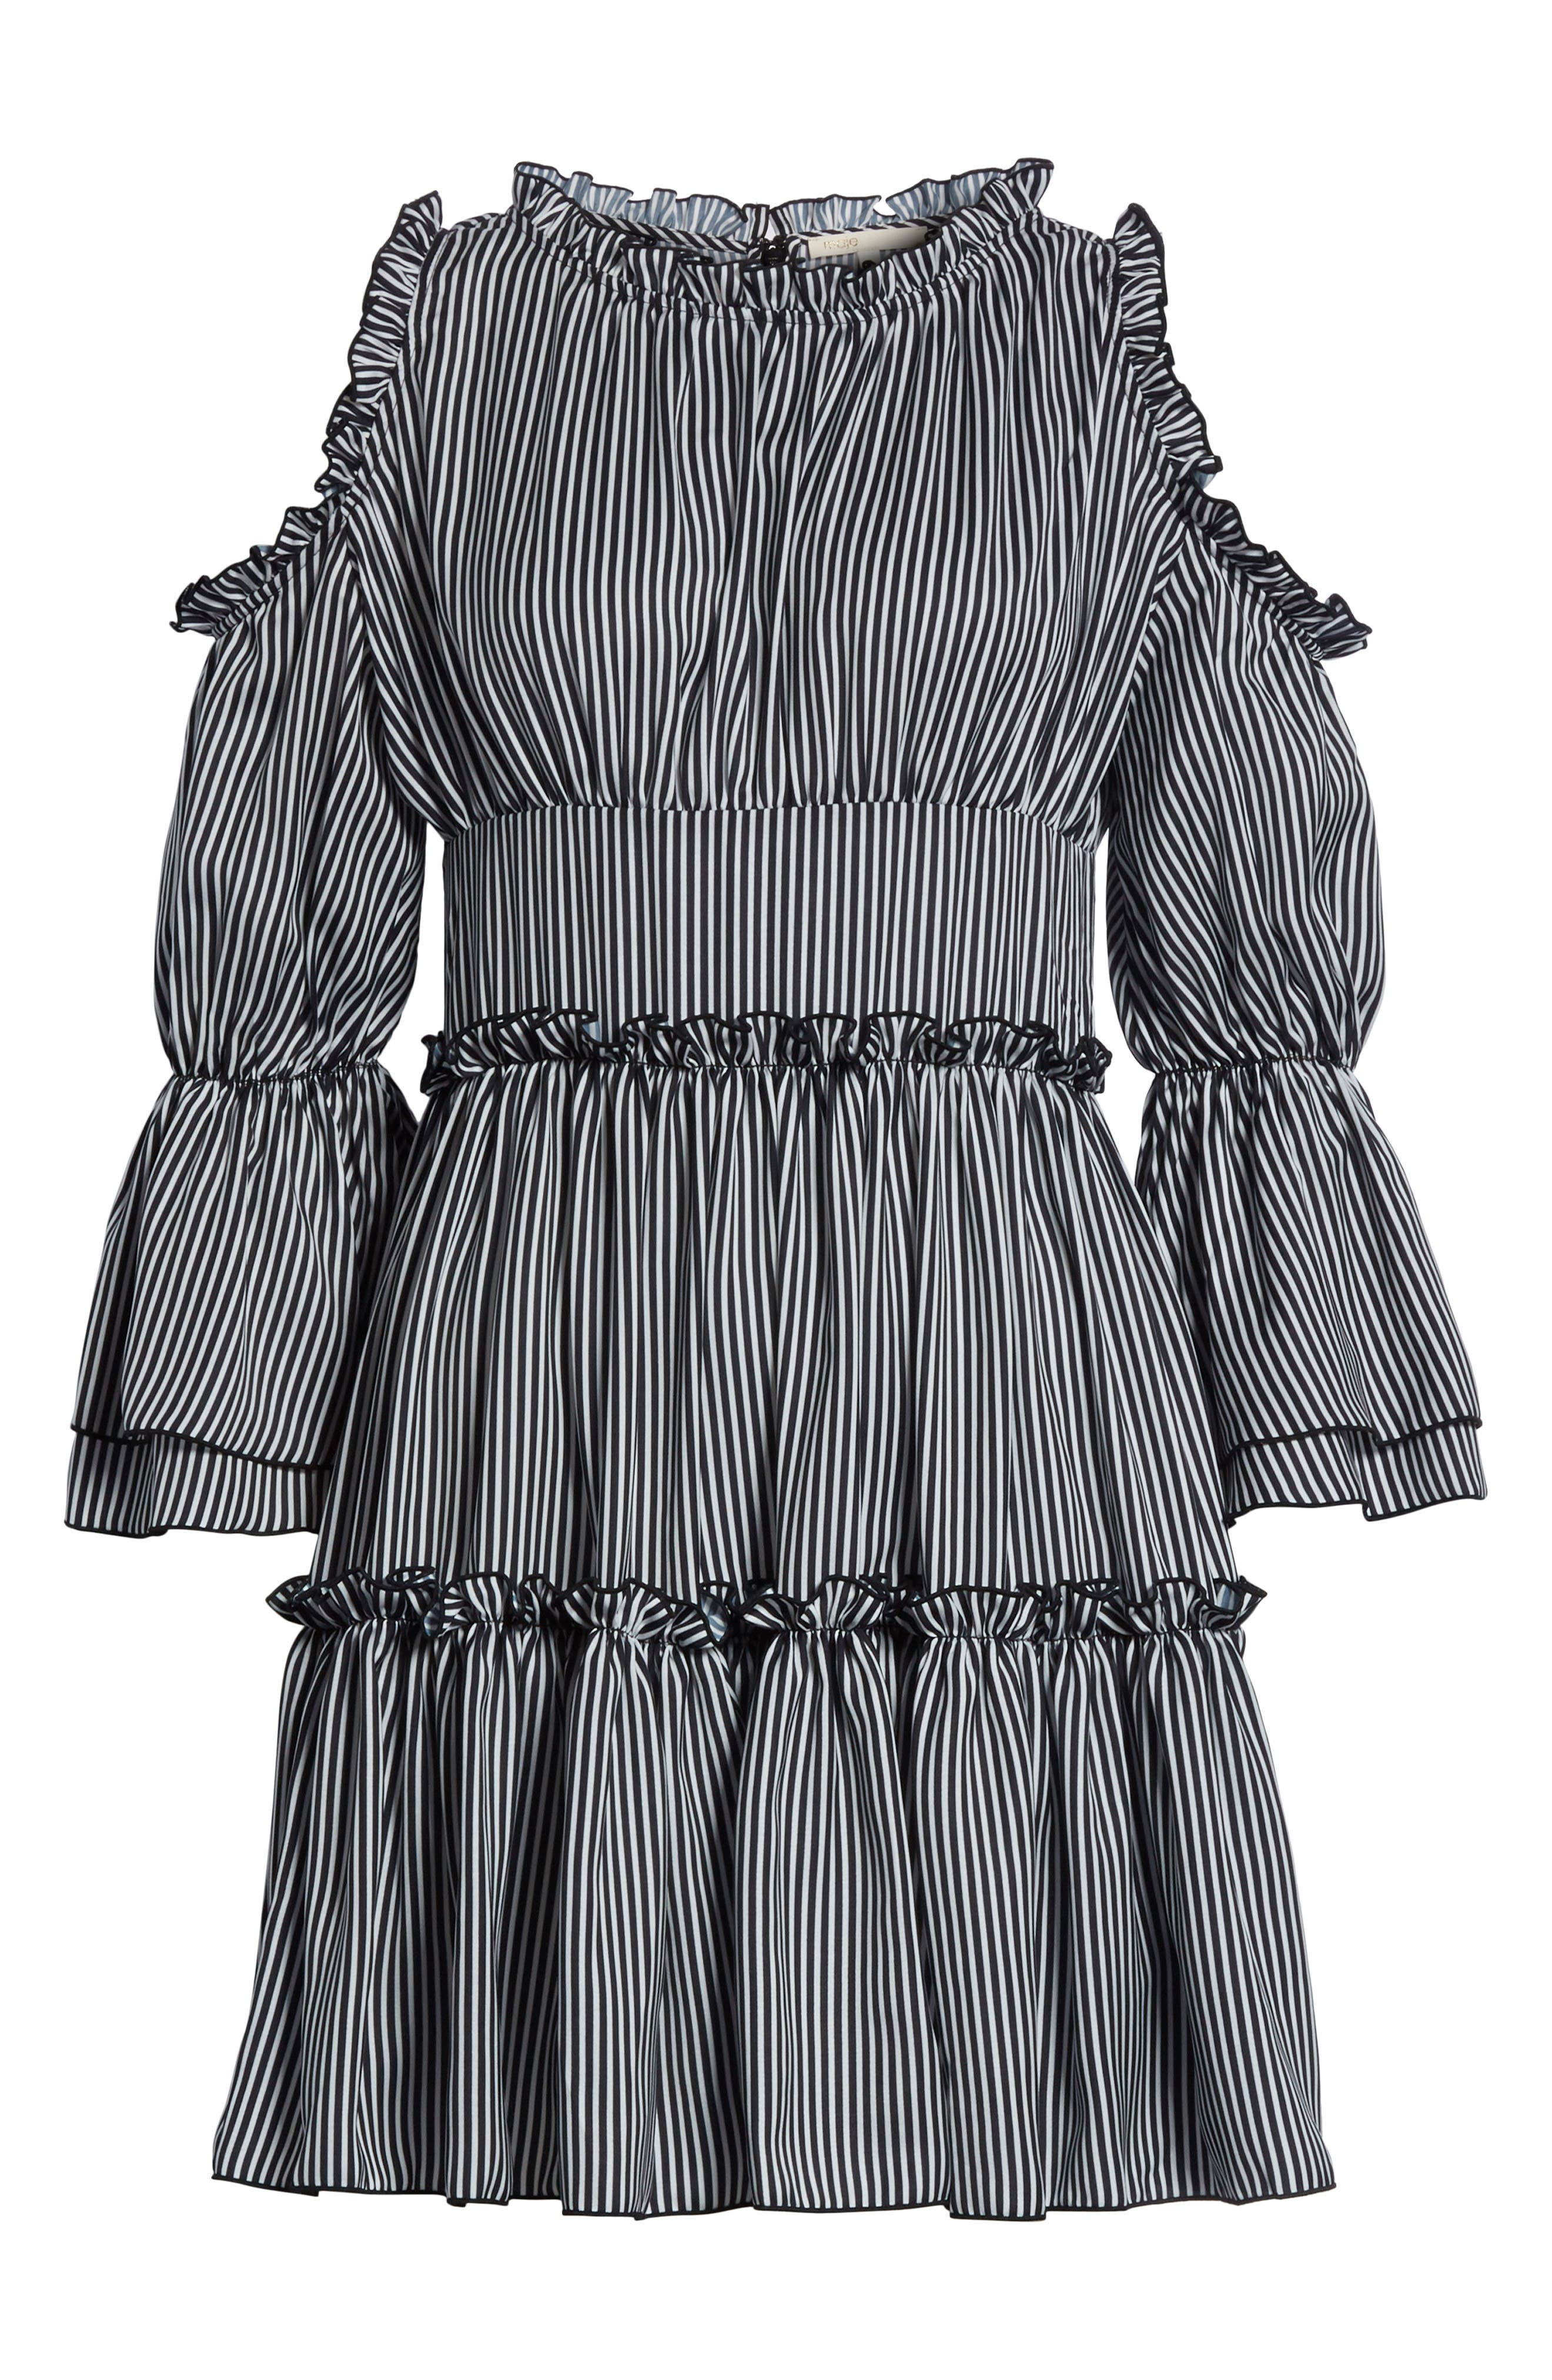 Radise Cold Shoulder Ruffled Minidress,                             Alternate thumbnail 6, color,                             Stripe